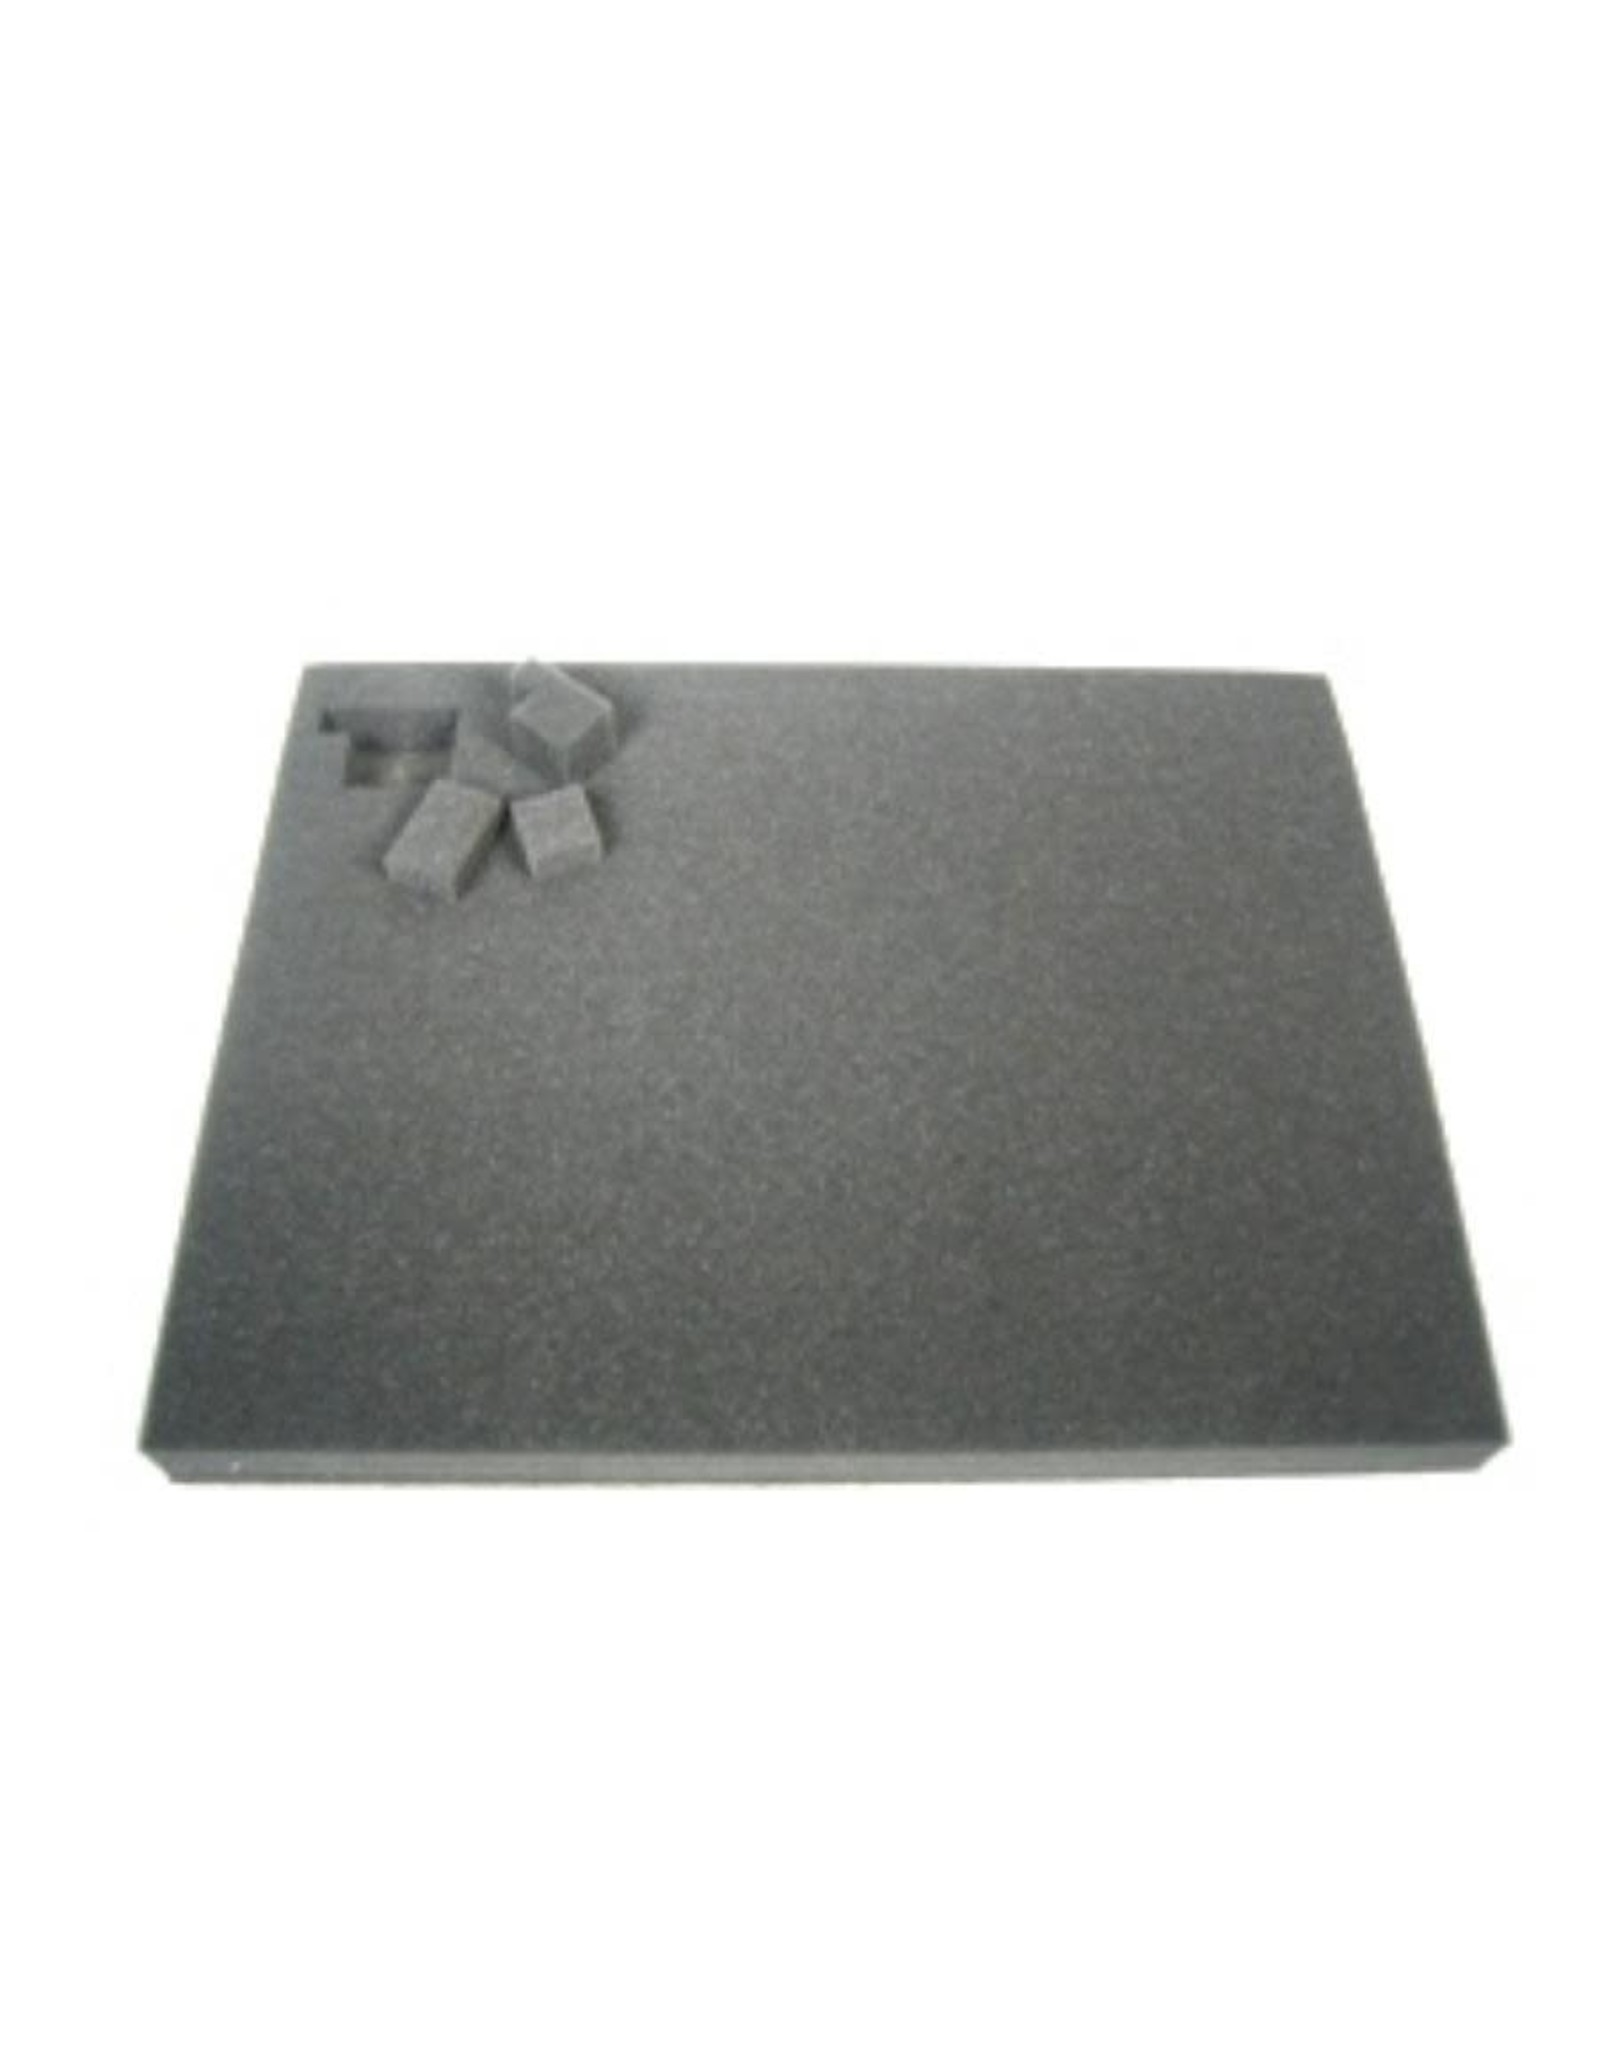 Battlefoam 1.5 Inch Pluck Foam Tray for the Shield/Spear Bag (GW) 14.25W x 10.25L x 1.5H